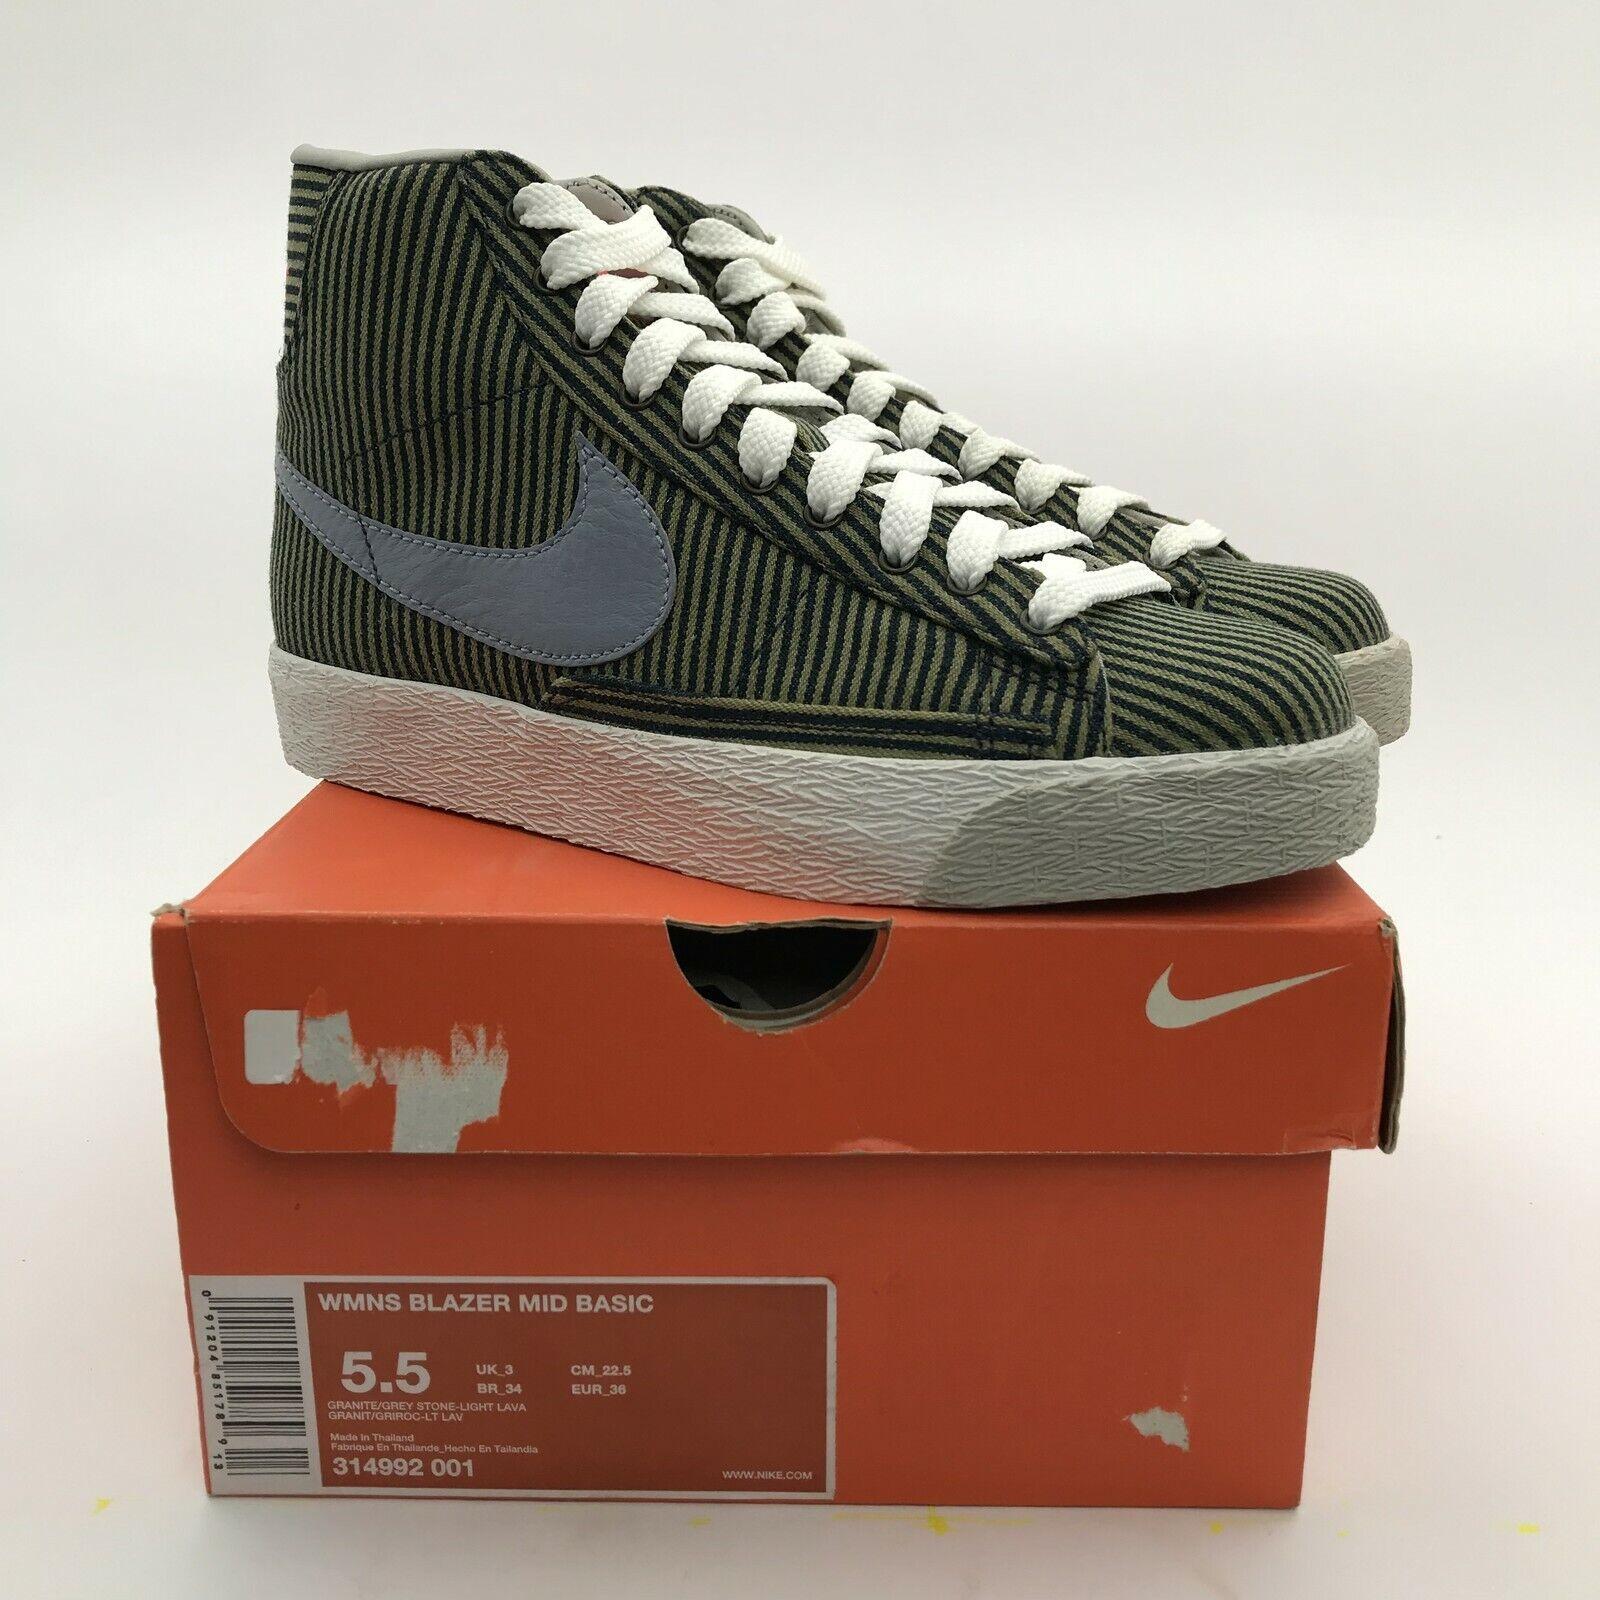 Nike Women Blazer Mid Basic Pinstripe Graphite Grey 314992-001 sb NEW US 5.5